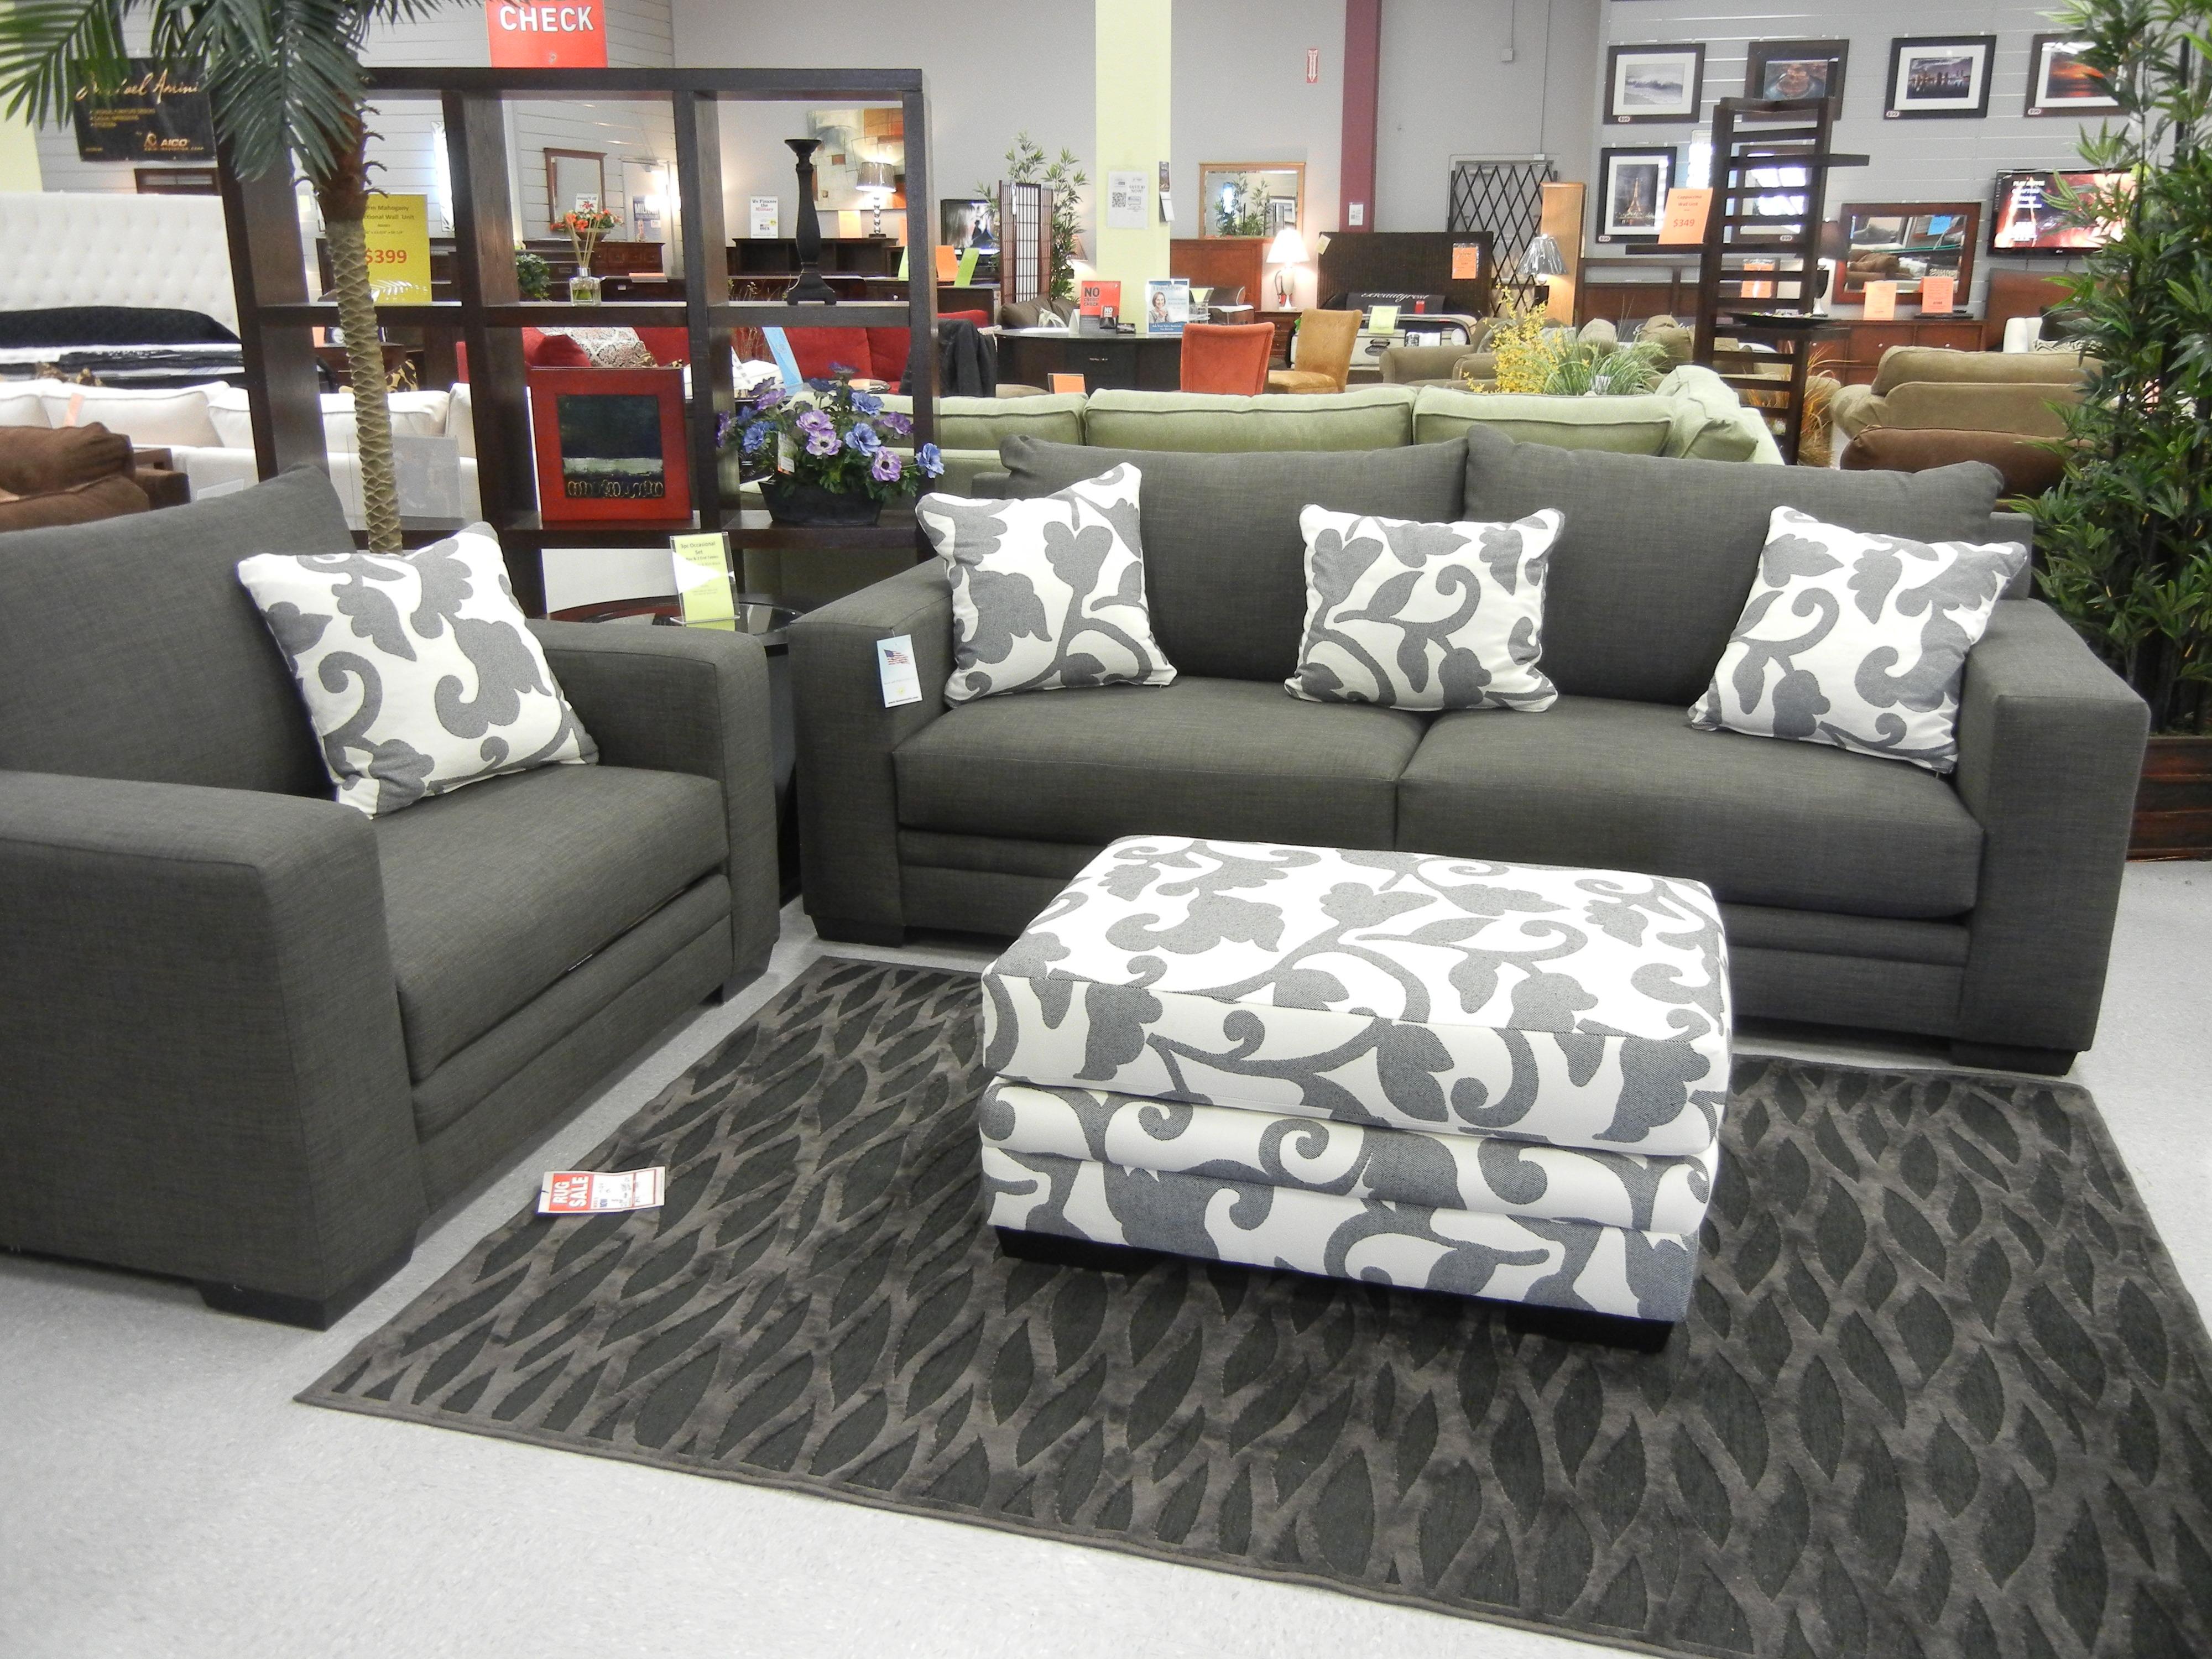 Real Deal Furniture   WordPress.com